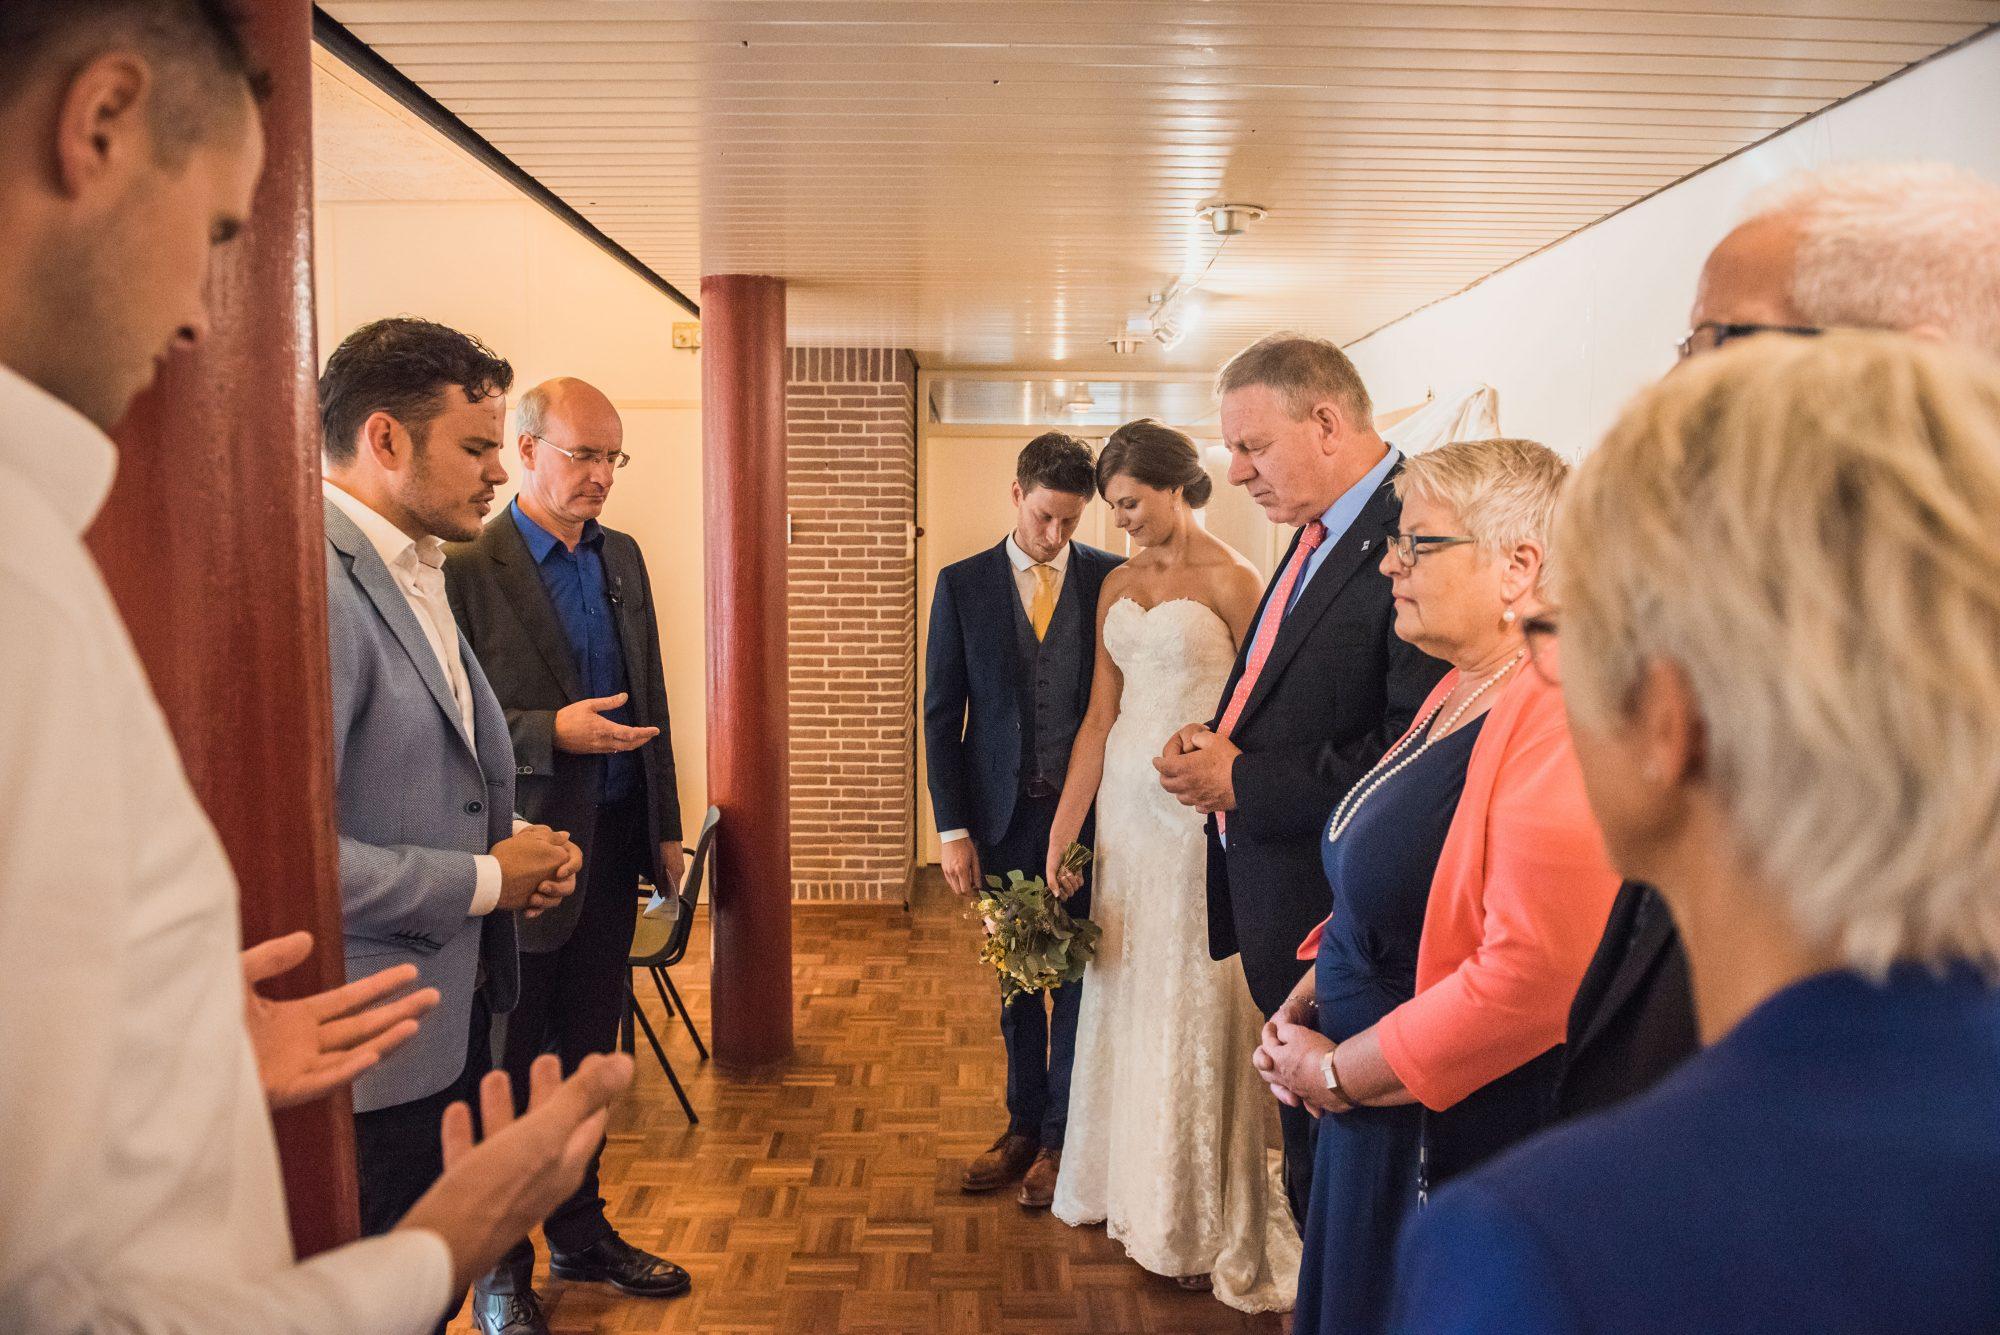 bruiloft-roland-annewil-411